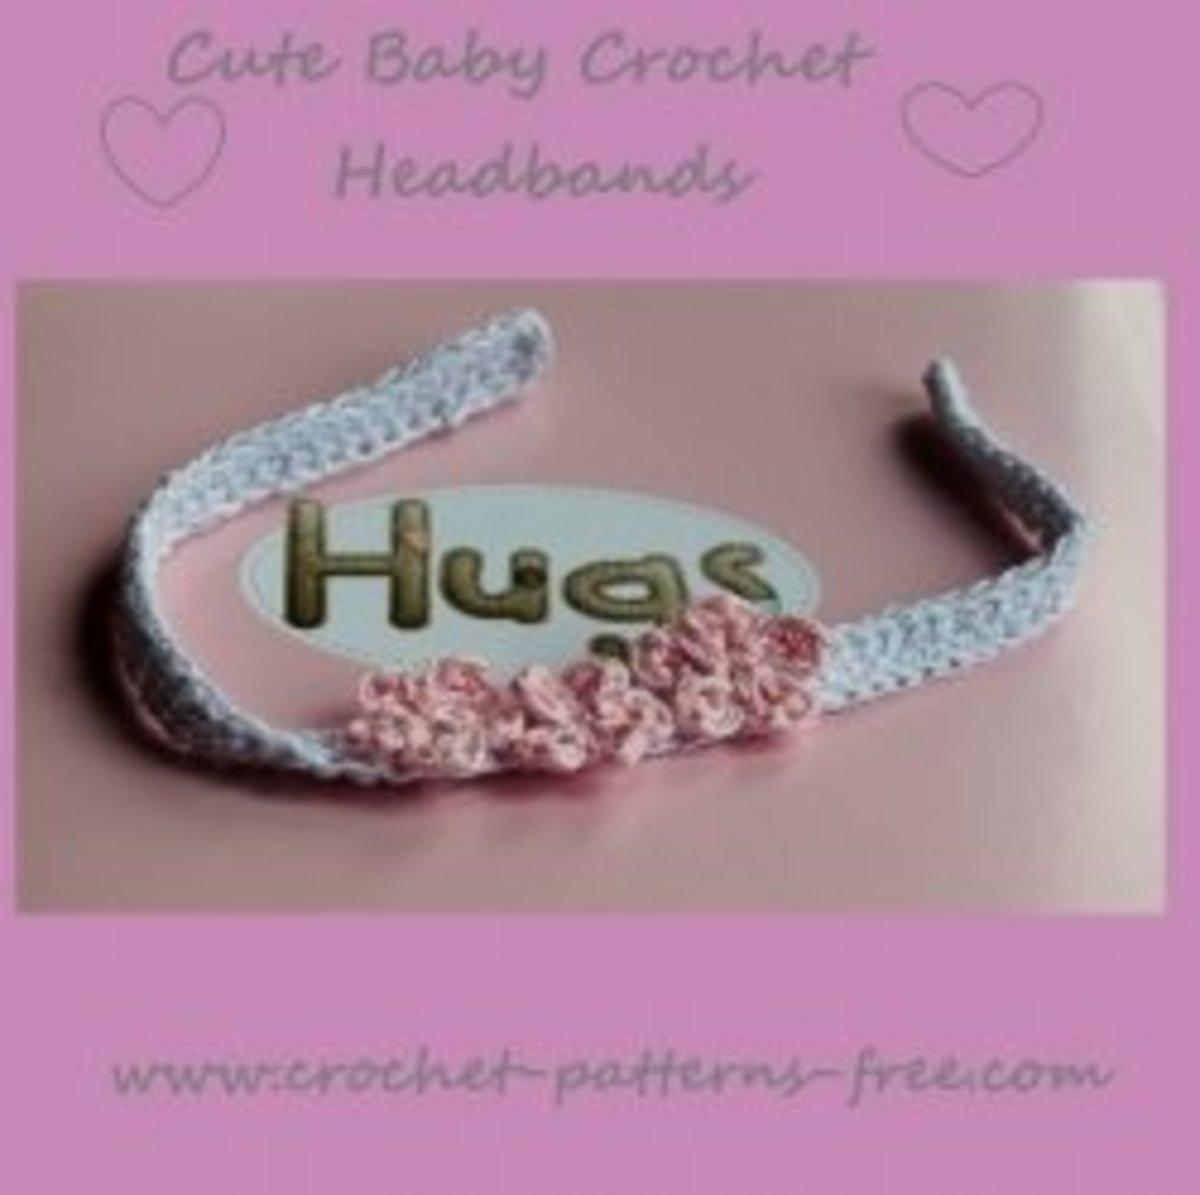 Cute Baby Crochet Headband Patterns